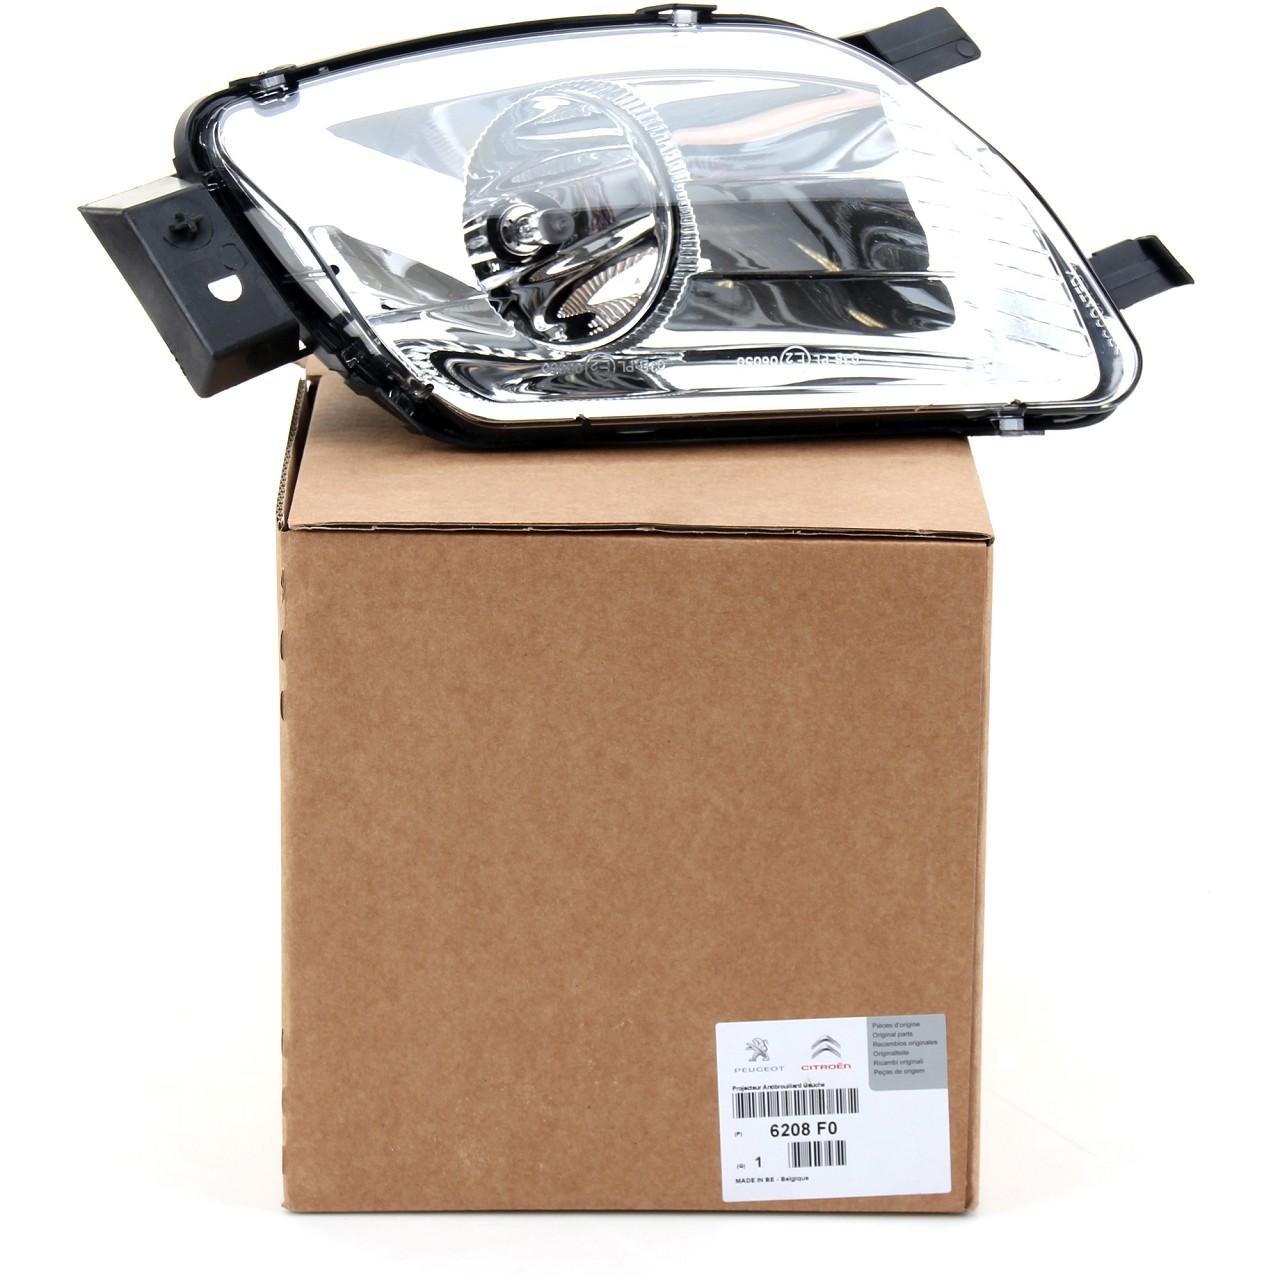 ORIGINAL Peugeot Nebelscheinwerfer Nebelleuchte Nebellicht 308 RCZ links 6208.F0